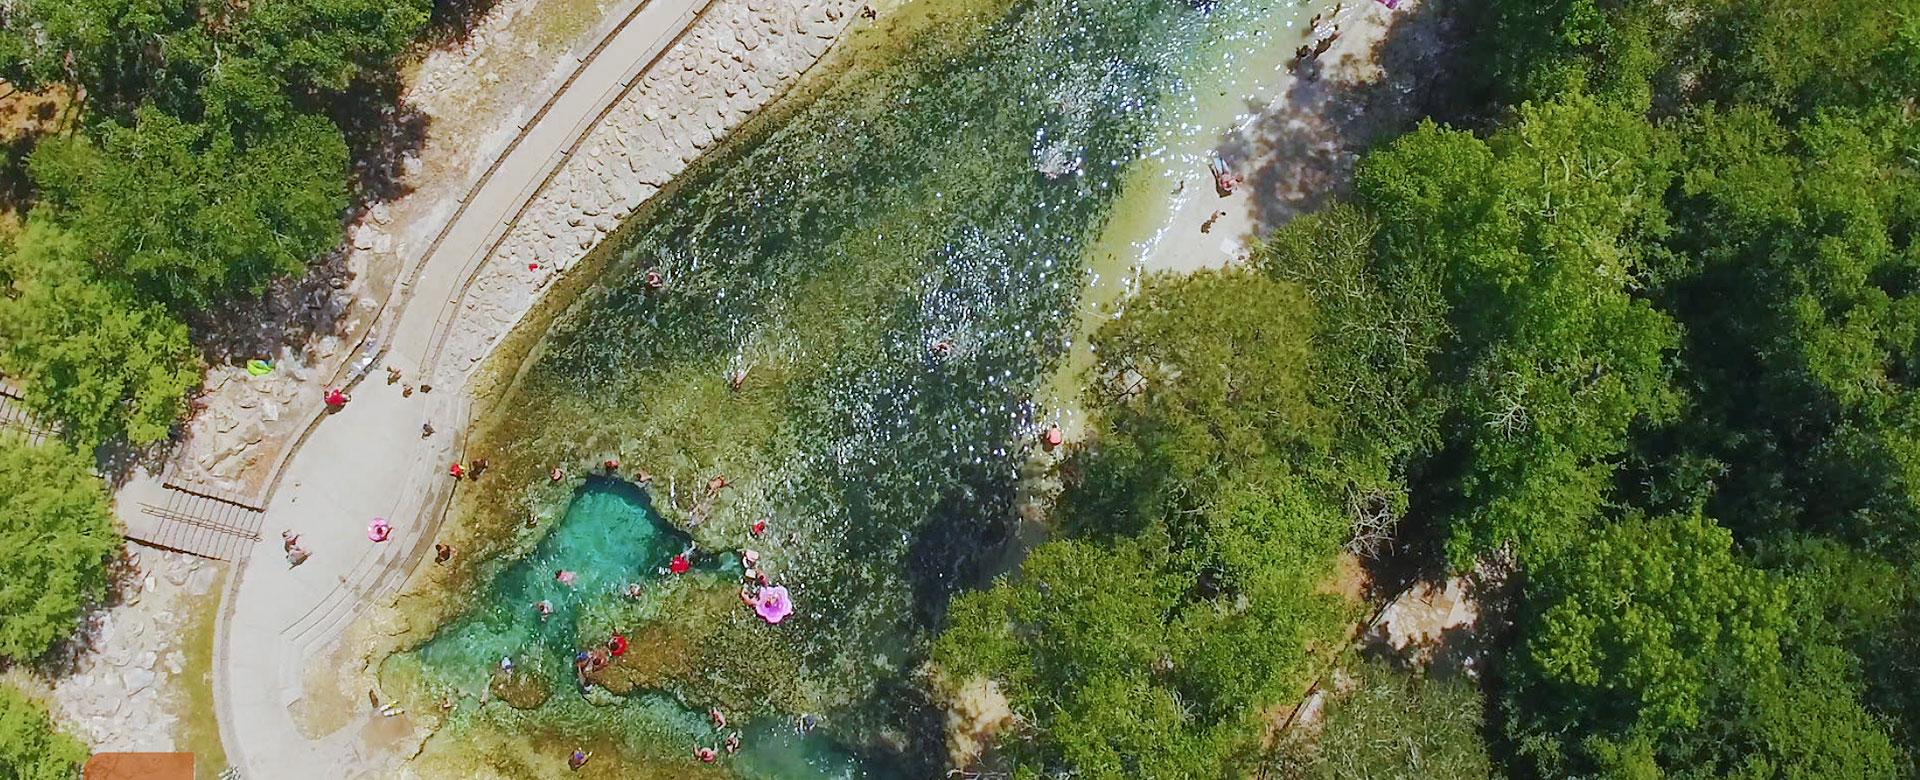 Suwannee River aerial view